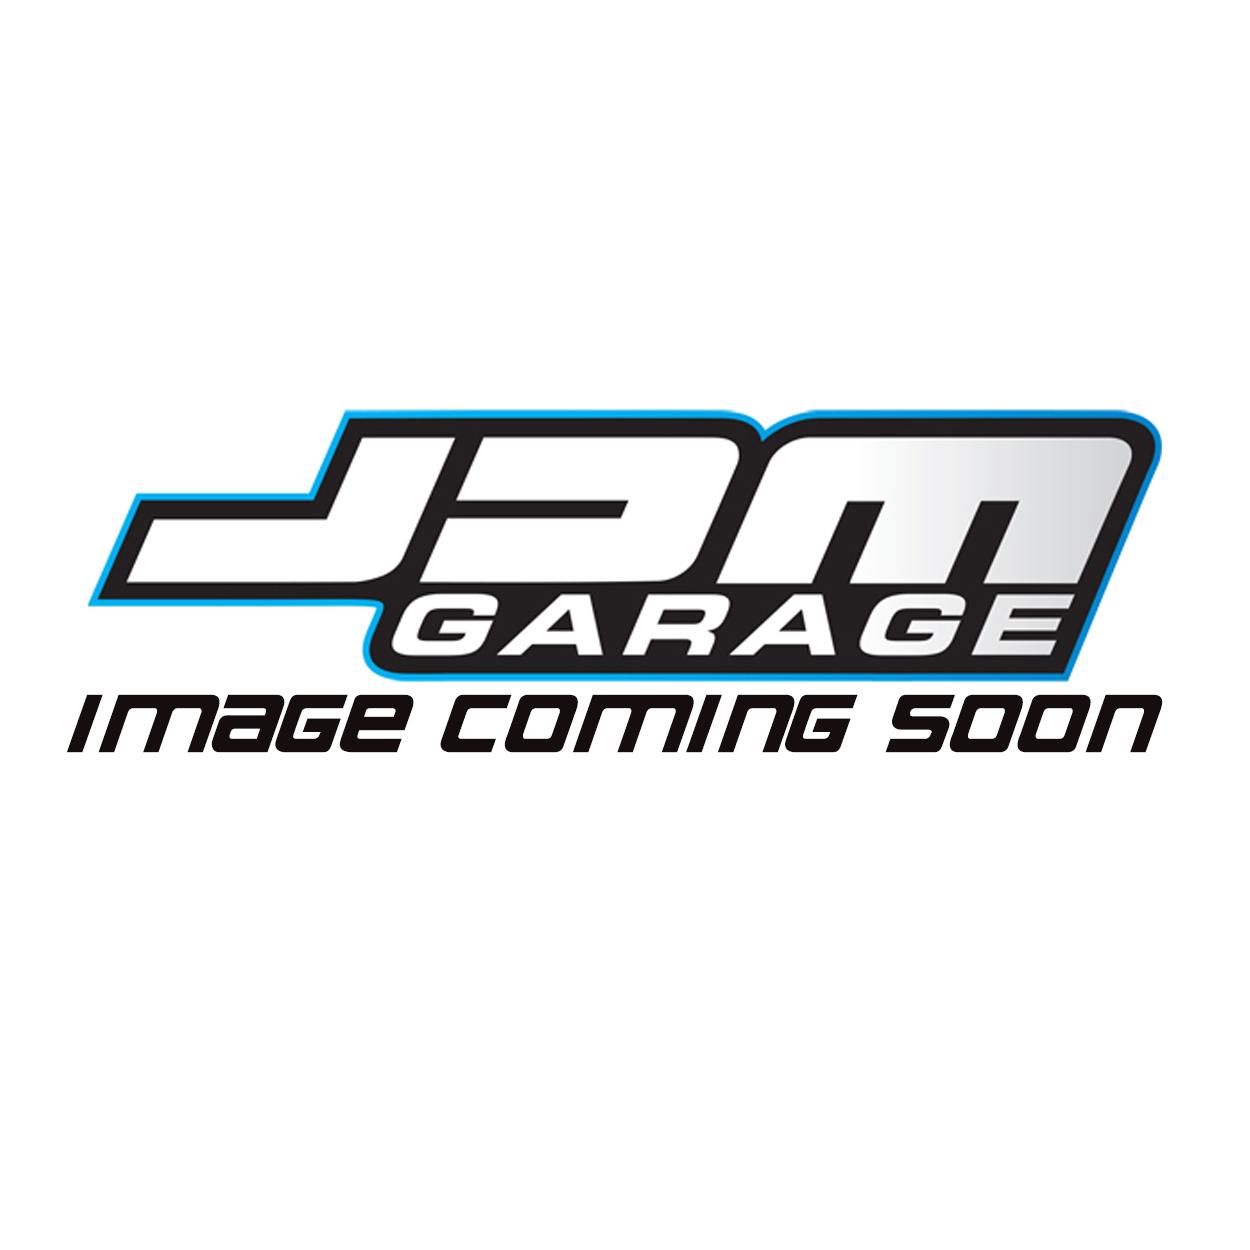 CP Pistons - Nissan 350Z / R35 GTR / VQ35DE / VQ35HR / VR38DETT